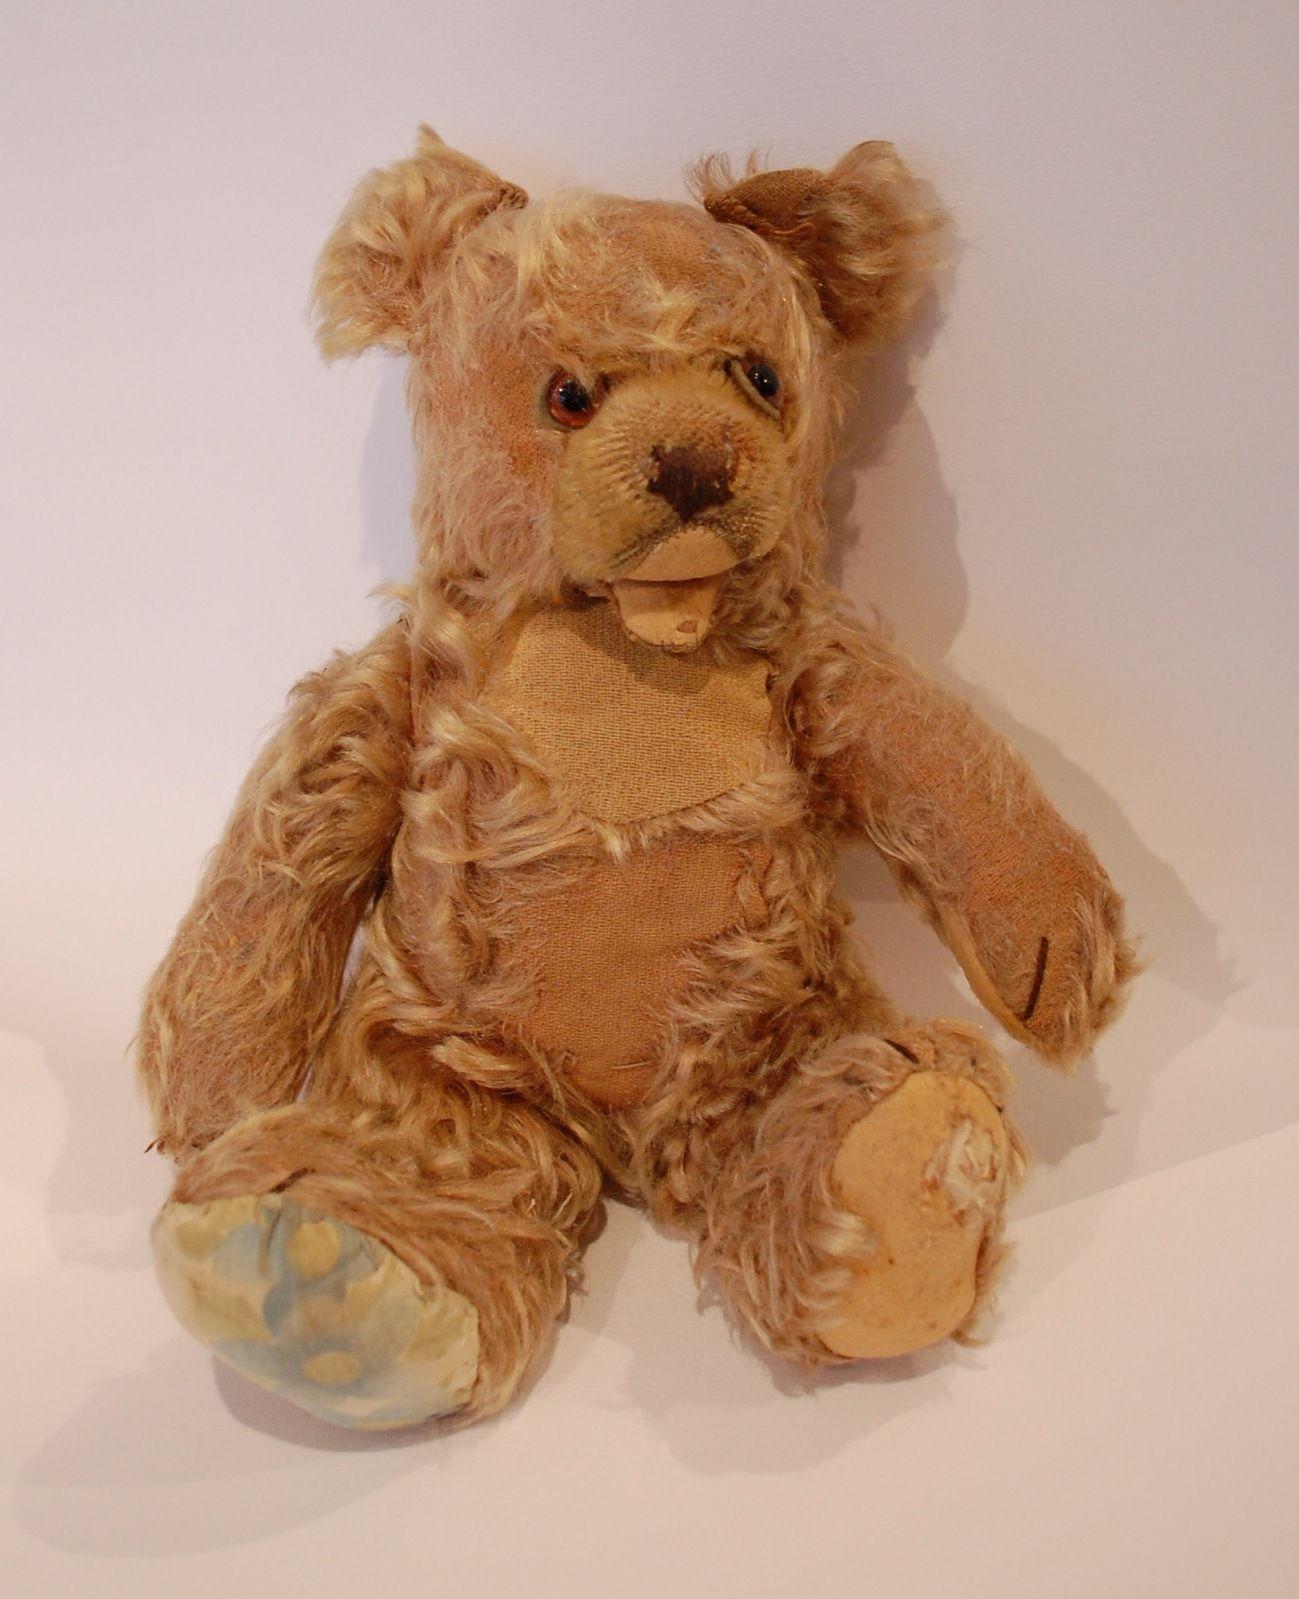 ours en peluche articul ancien steiff hermann old teddy bear ebay emotion pinterest. Black Bedroom Furniture Sets. Home Design Ideas